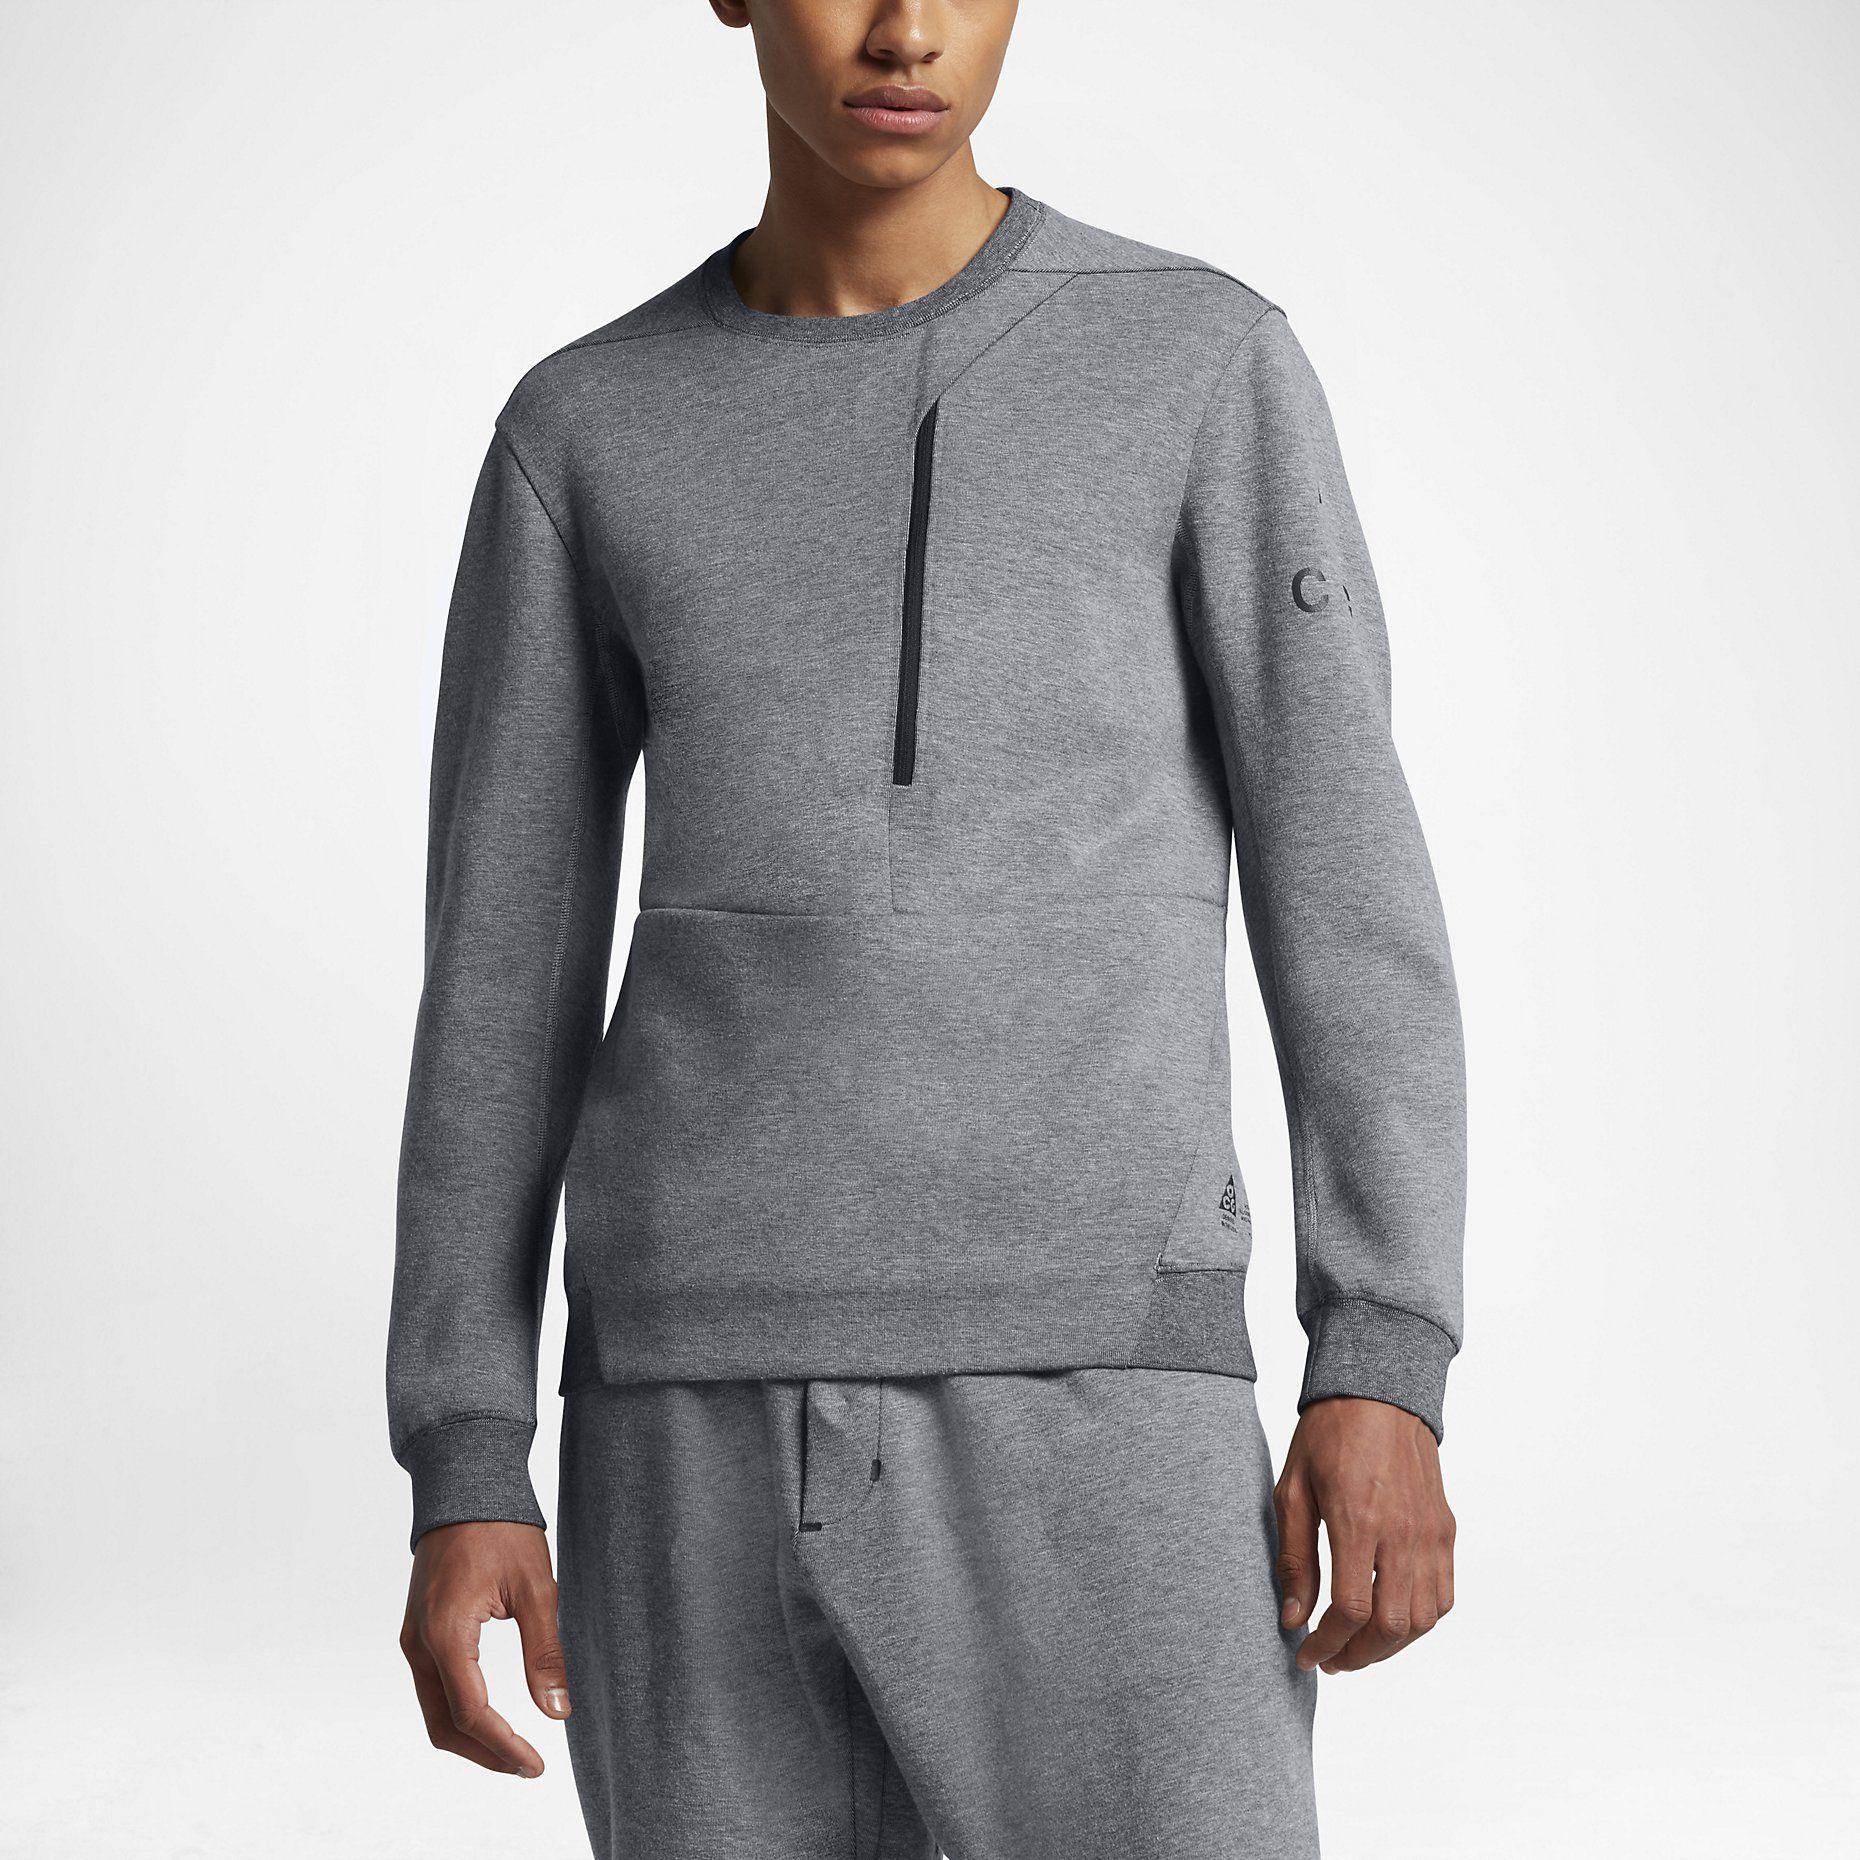 Nike Tech Fleece Quilt Crew